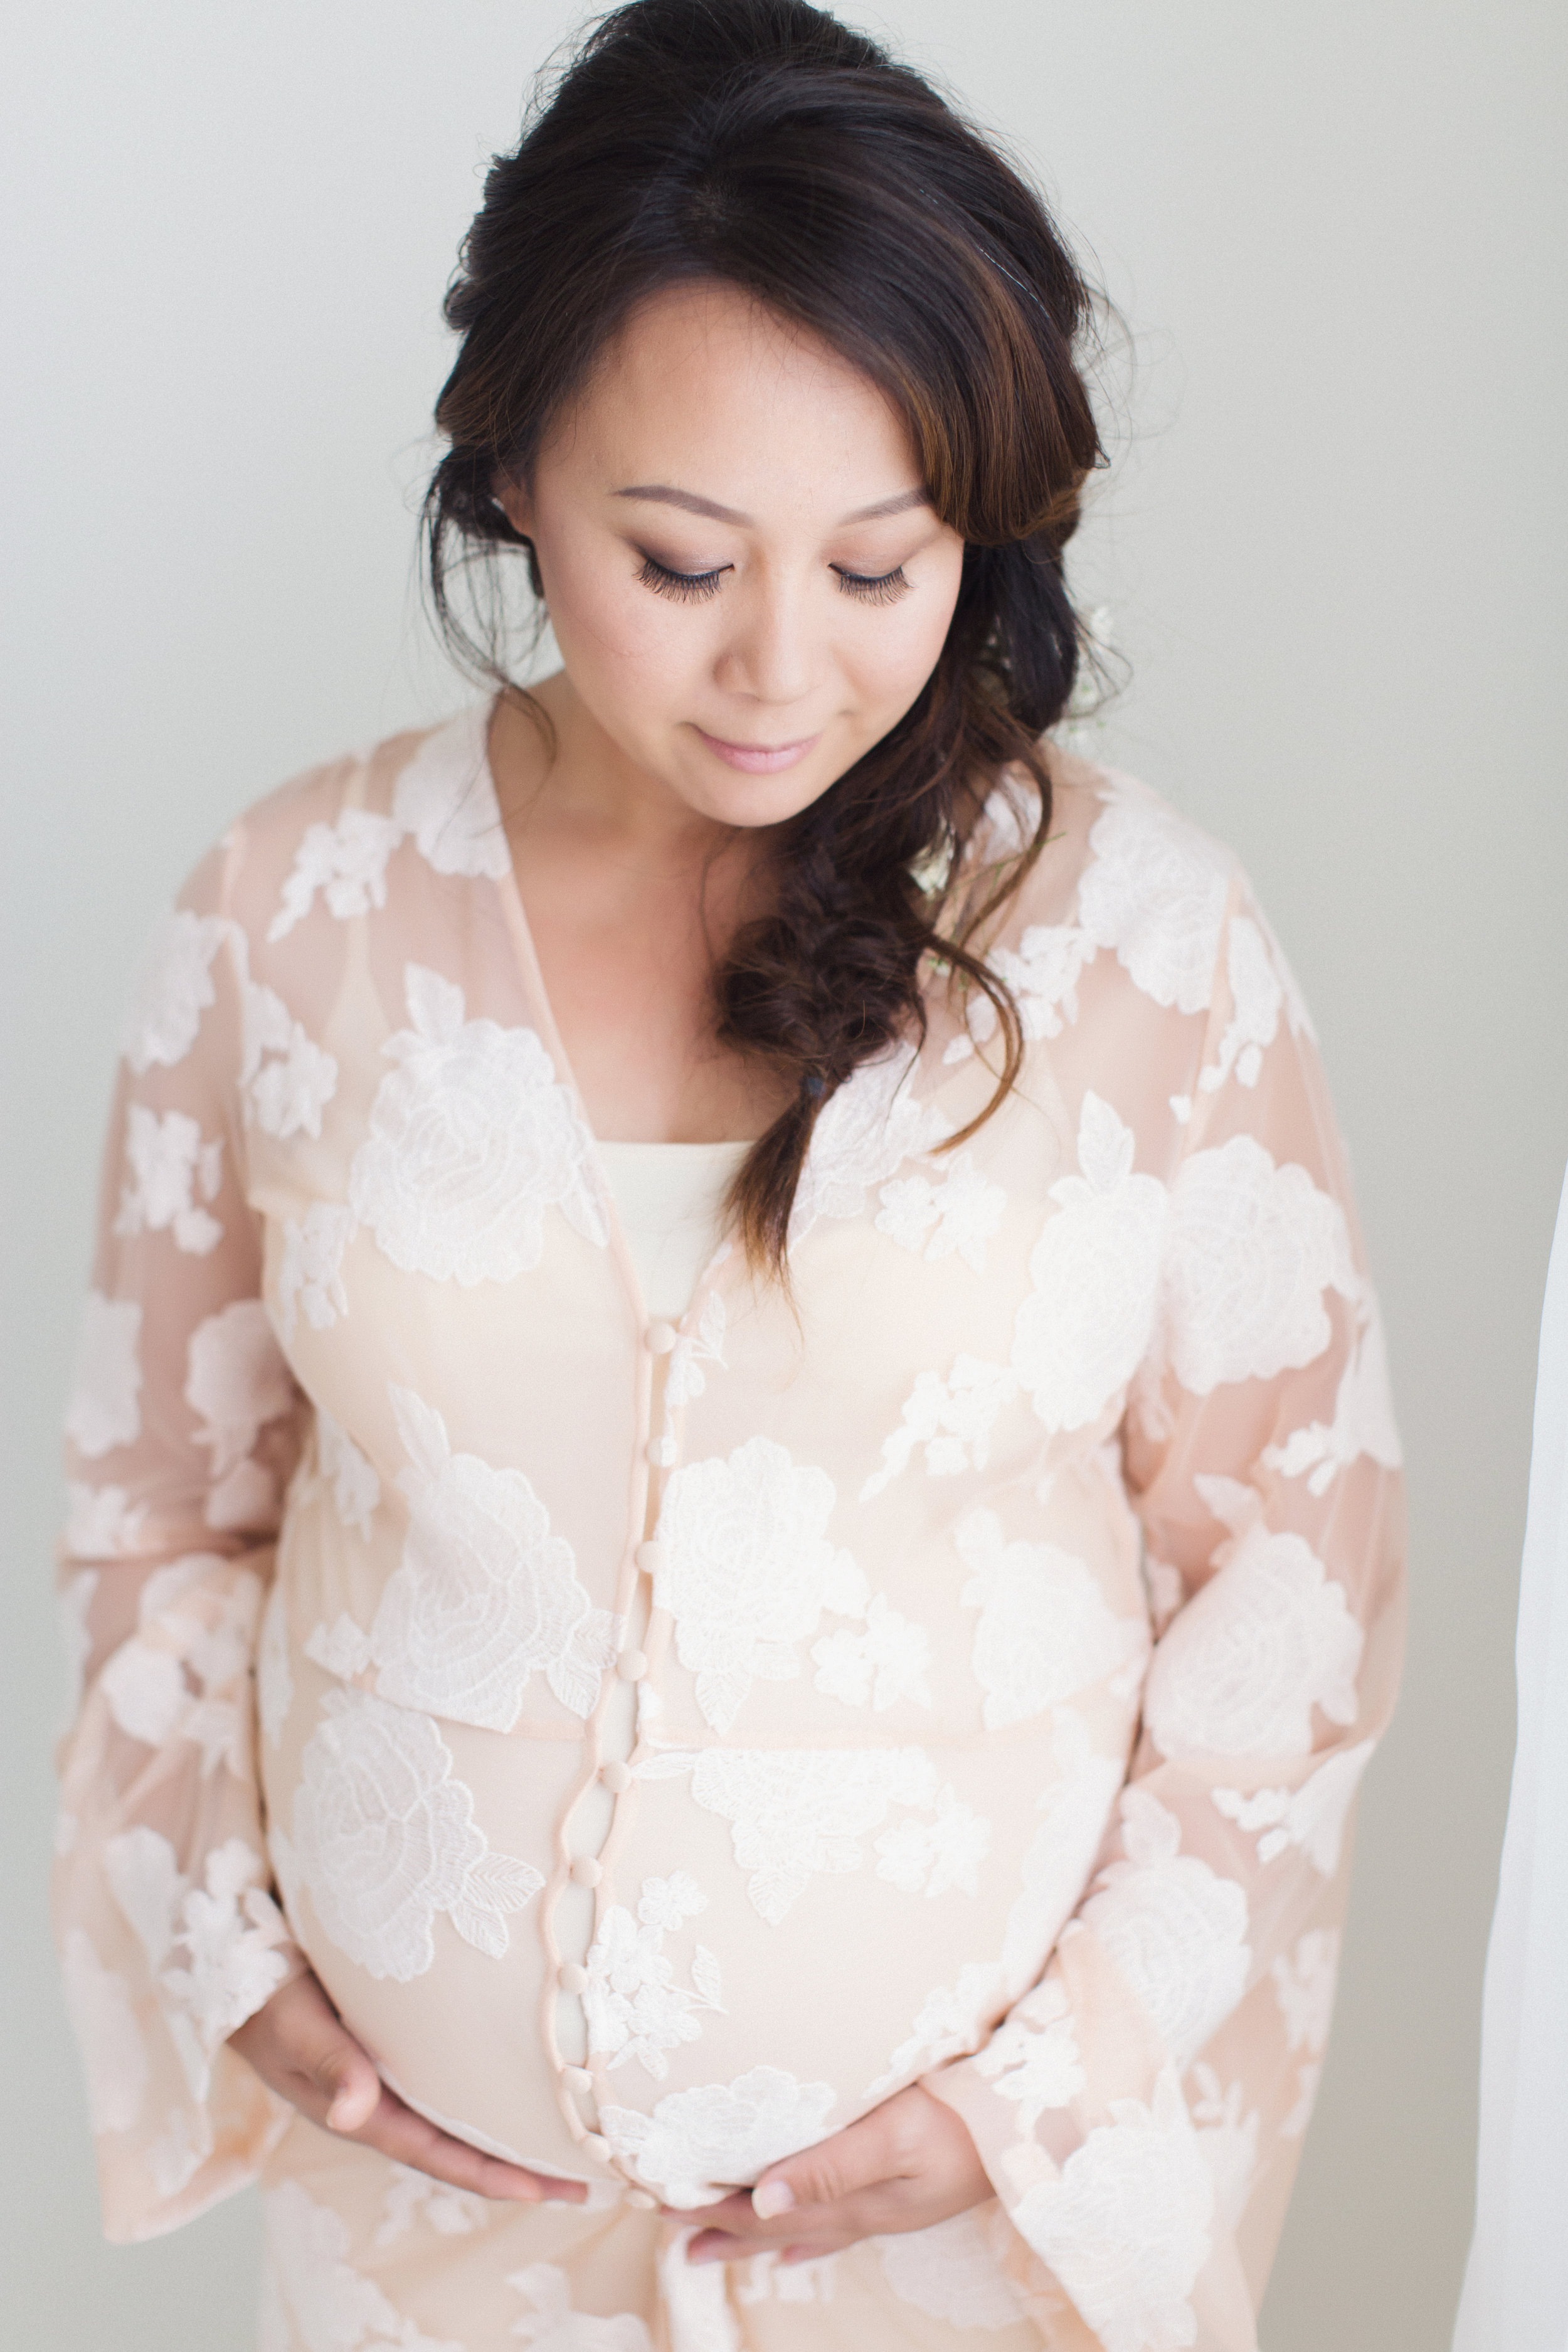 Michelle-Popp-Photography-Jadelyn Maternity-12.jpg